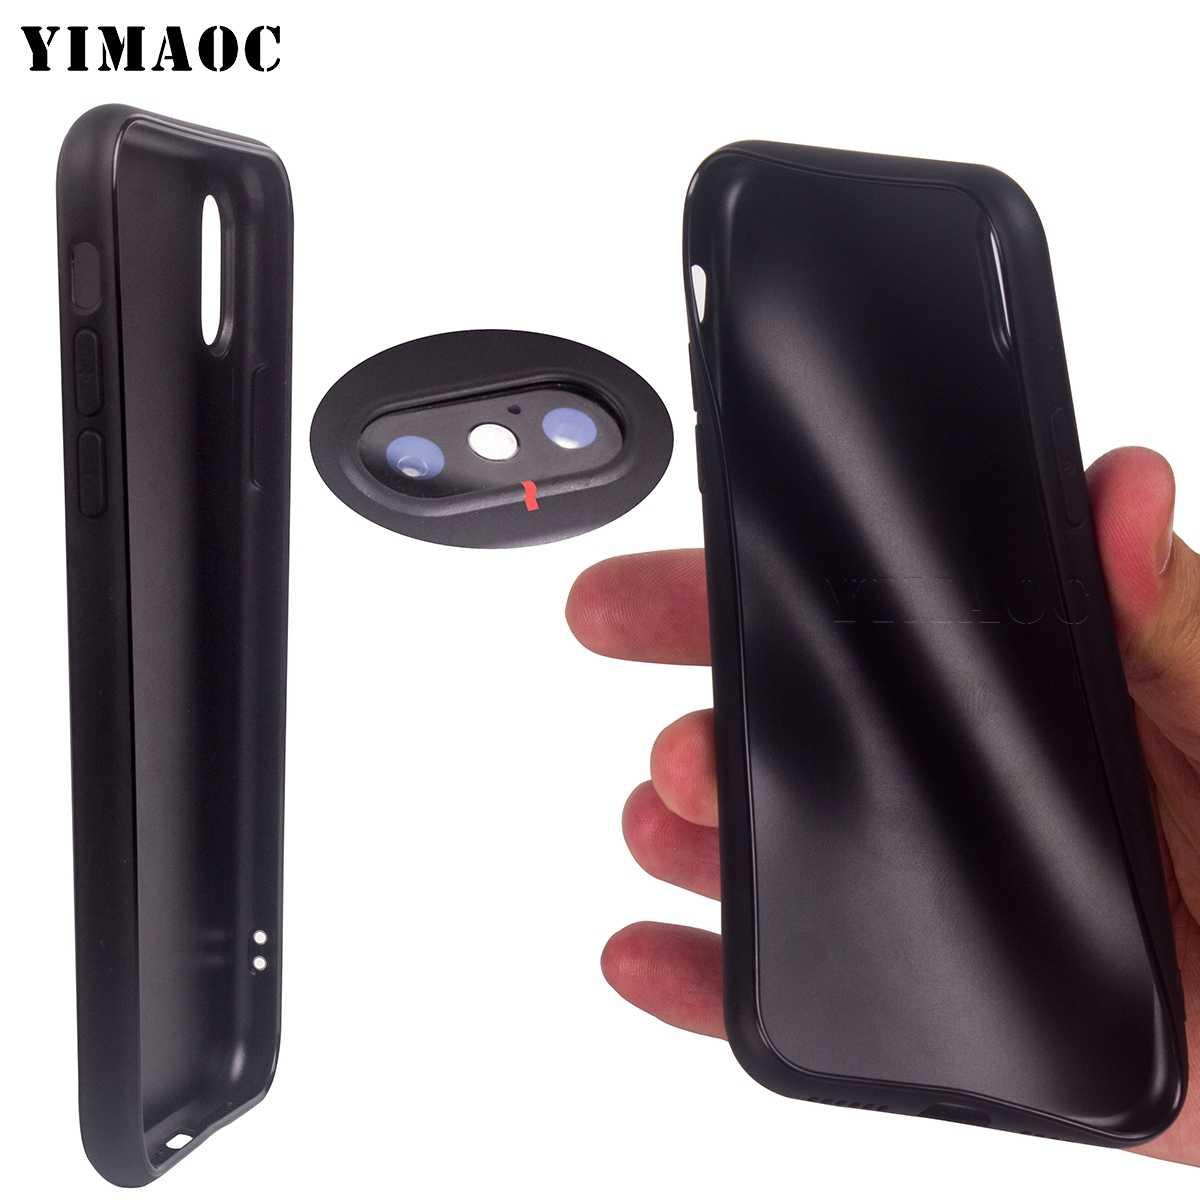 YIMAOC Mija Amber Giles silikon kılıf Xiaomi Redmi için Not 4 4x 4a 5 5a 6 8 Pro Başbakan Artı